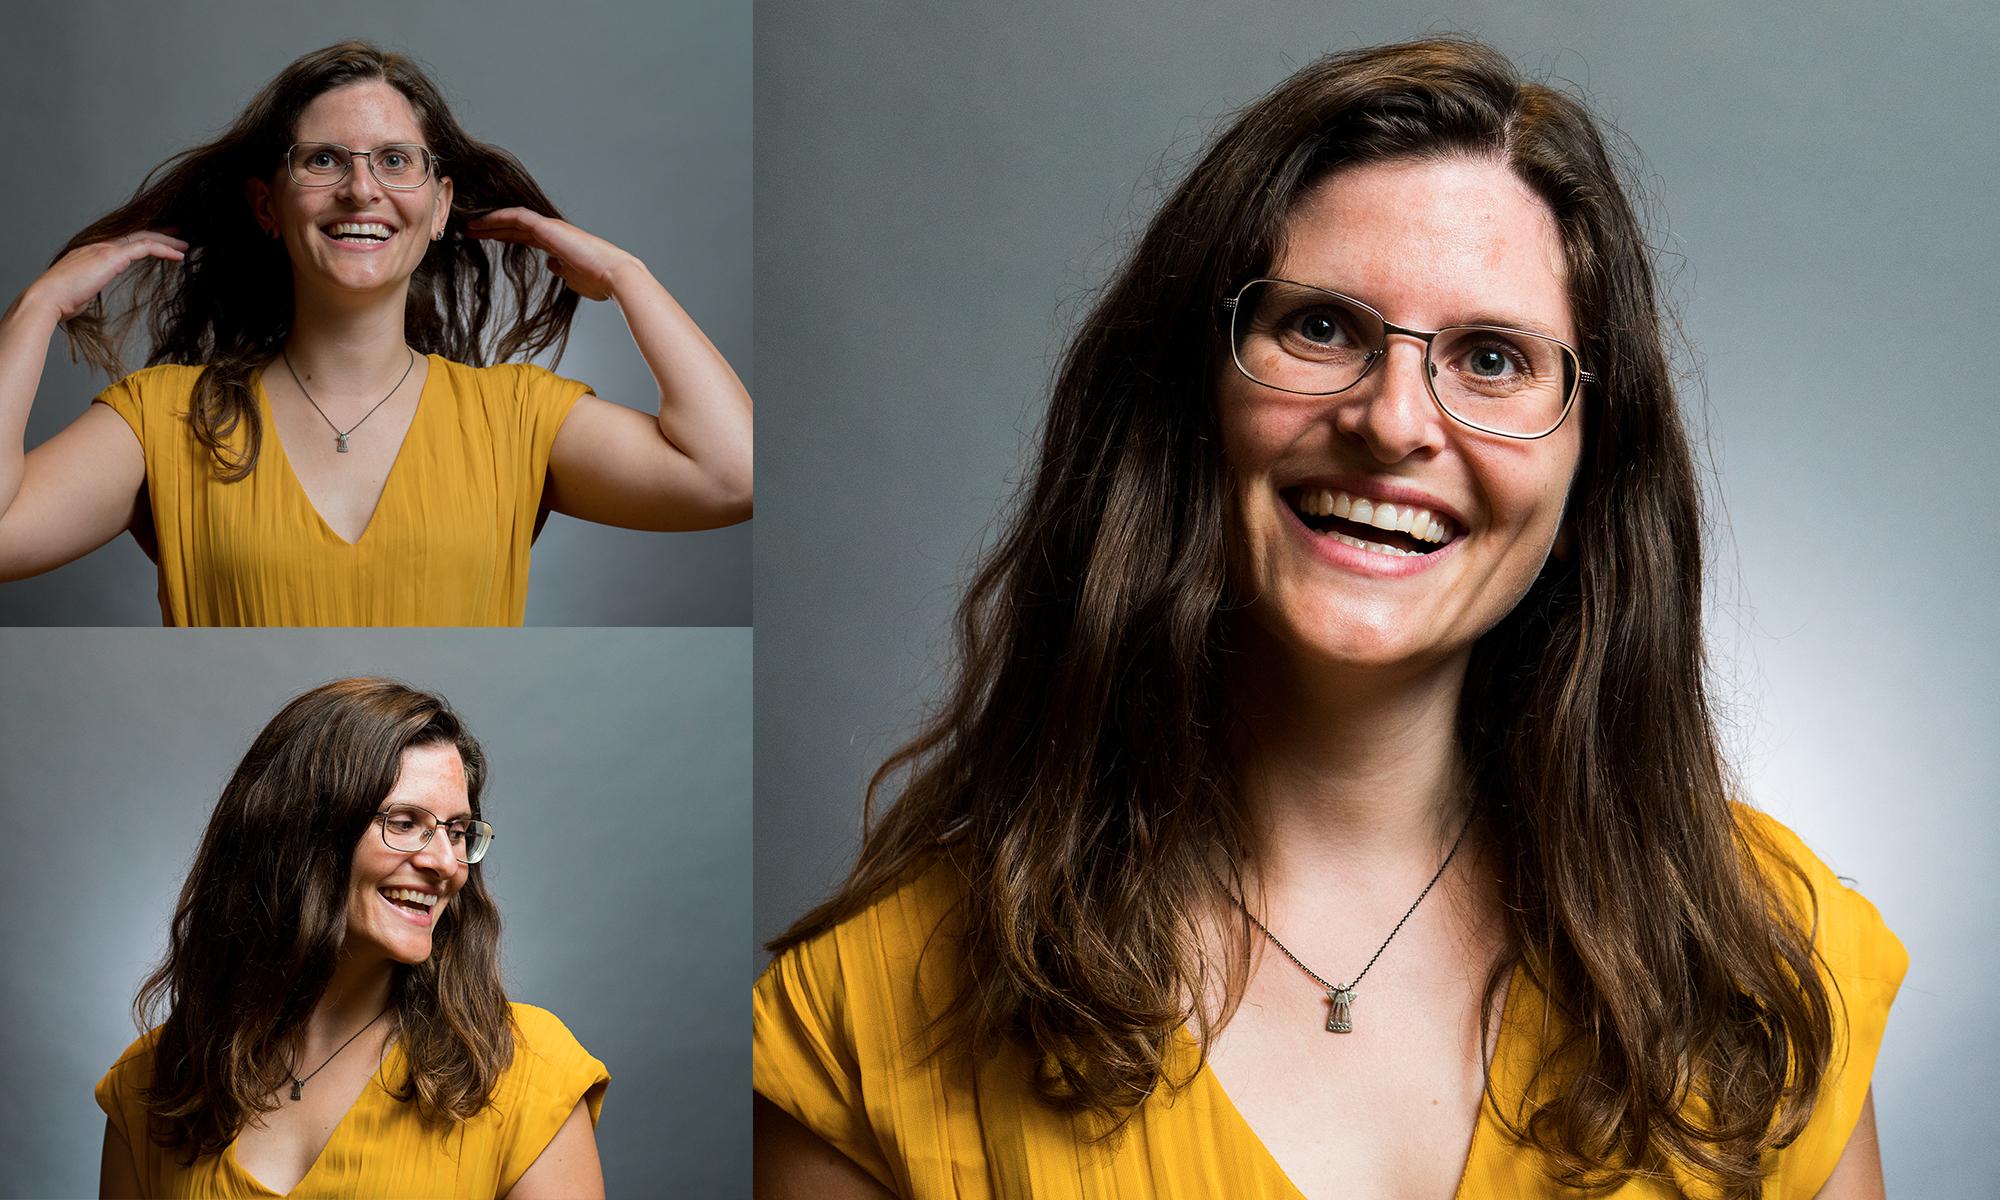 Five questions to Lea Würtz Kristensen, CFO of the startup Obtek